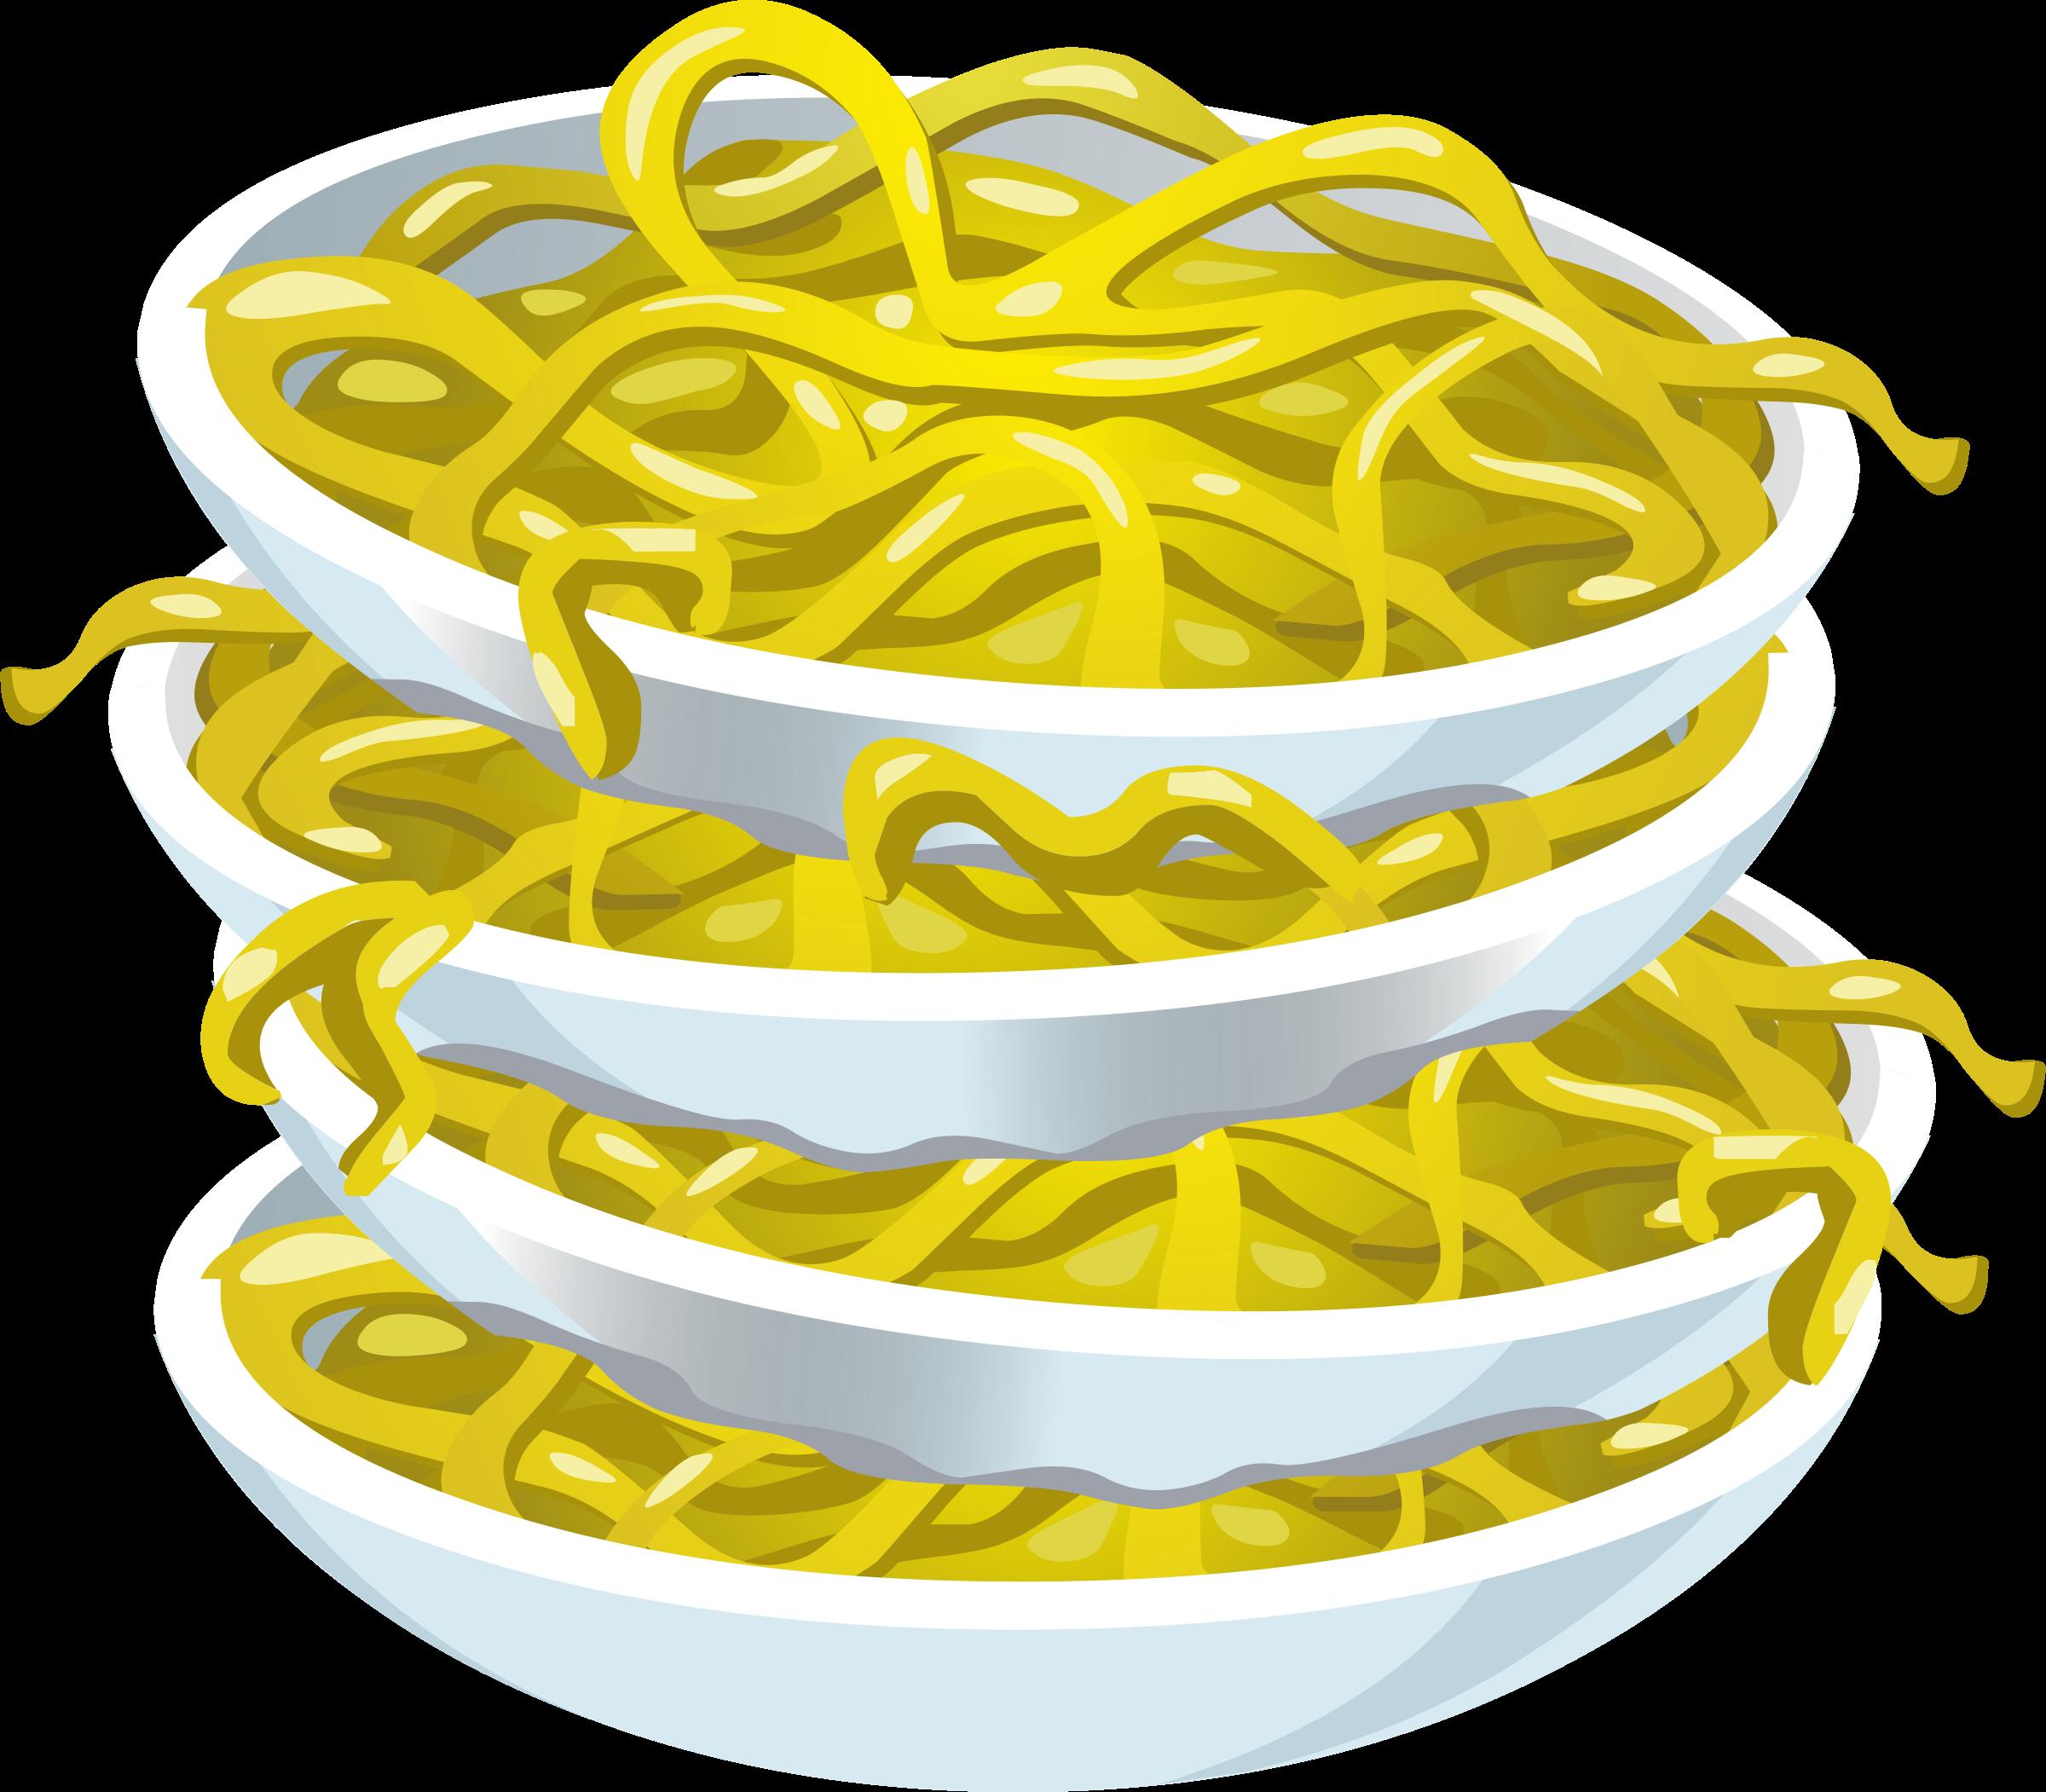 Free Noodles Cliparts, Download Free Clip Art, Free Clip Art.